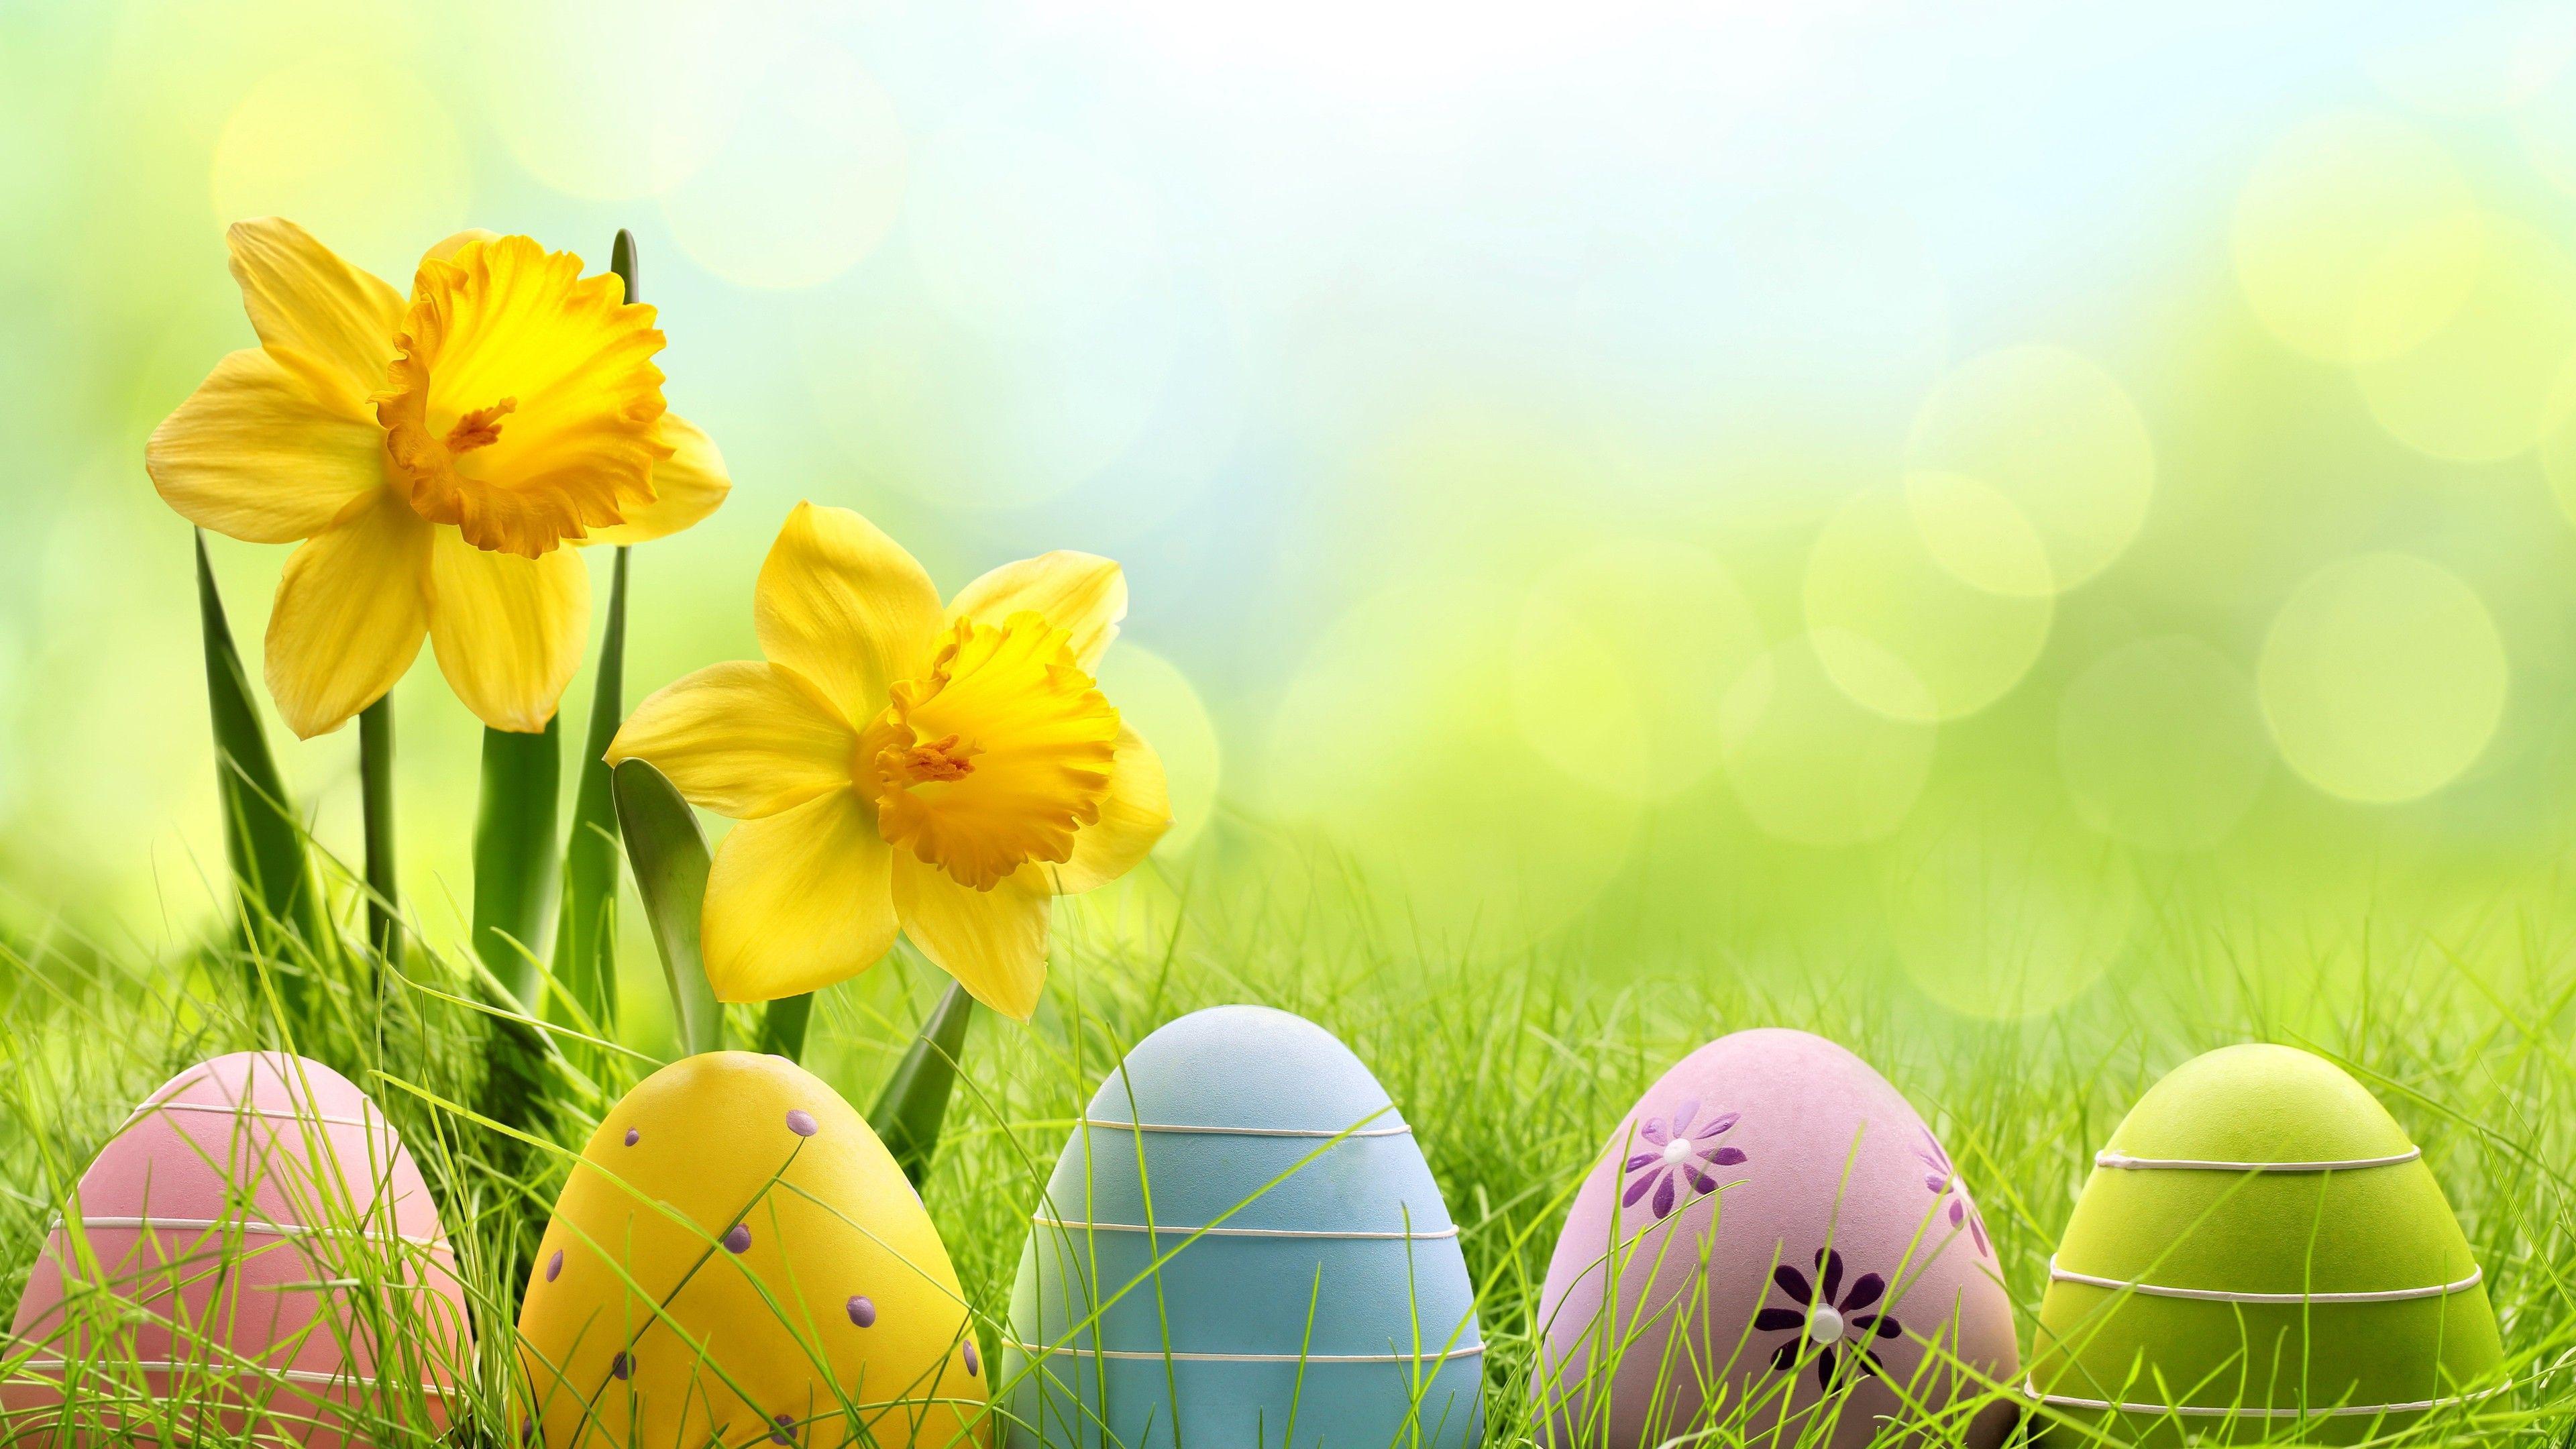 Holiday Easter Egg 4k Eggs Wallpapers Easter Wallpapers Celebrations Wallpapers Happy Easter Wallpaper Easter Wallpaper Easter Backgrounds